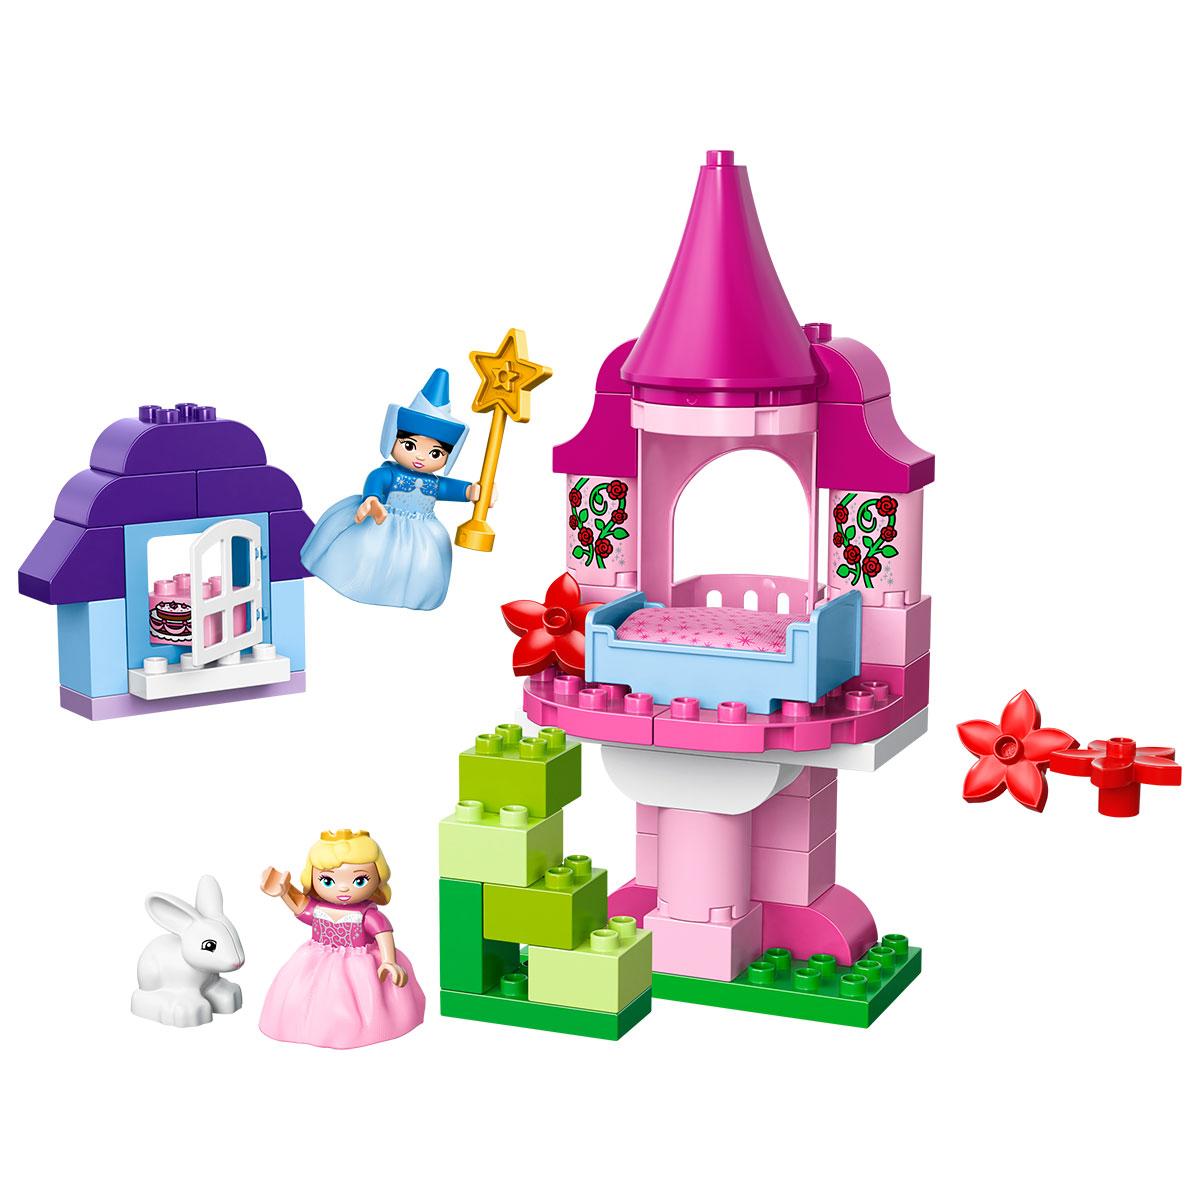 10542 Legoâ® Duploâ® Disney Princesseâ ¢ LA Belle AU Bois